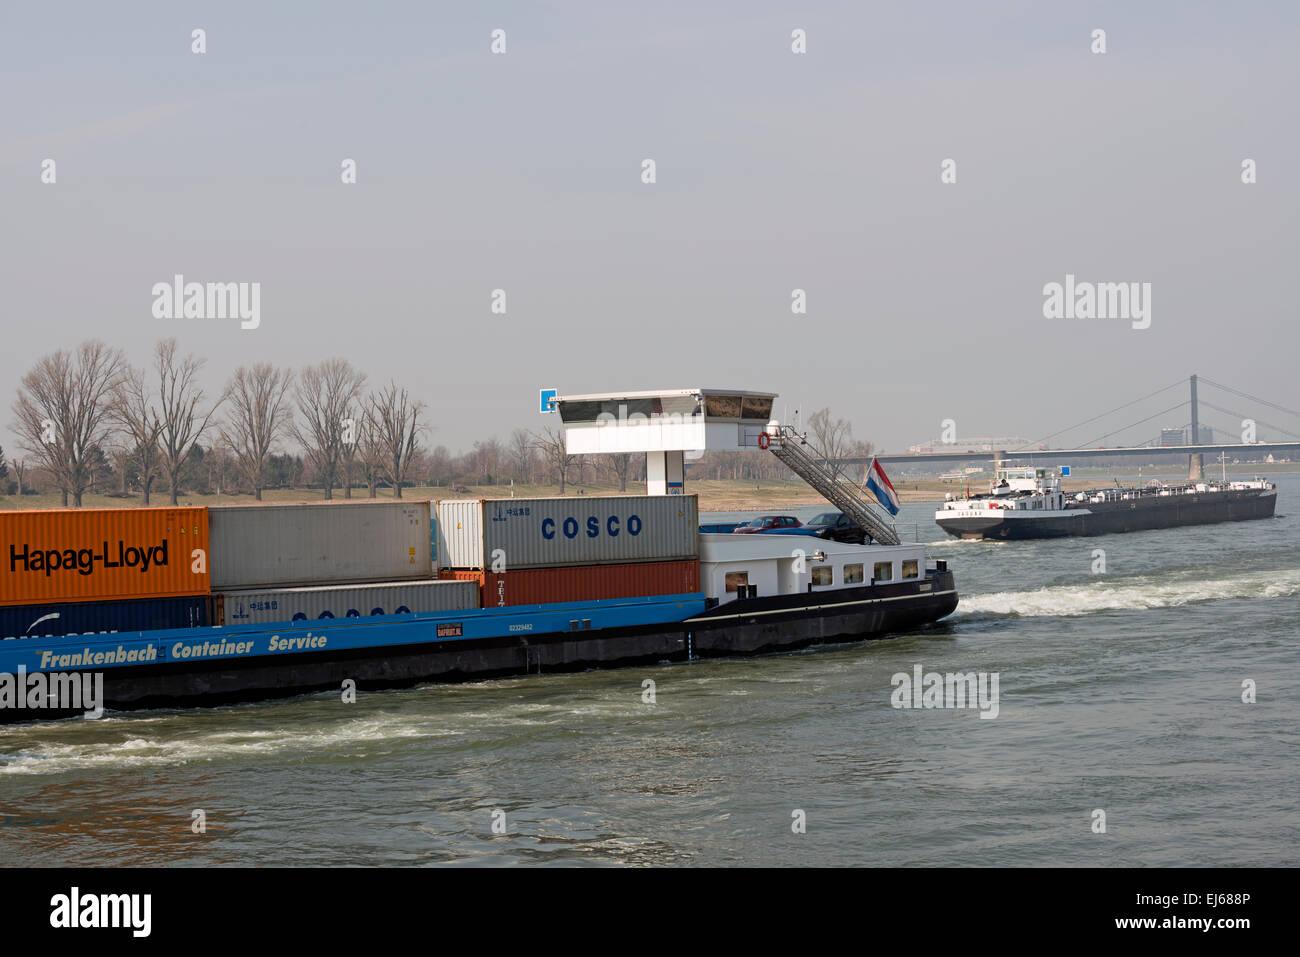 Joline II Frankenbach Ro-Ro Service barges, river Rhine, Dusseldorf, Germany. - Stock Image